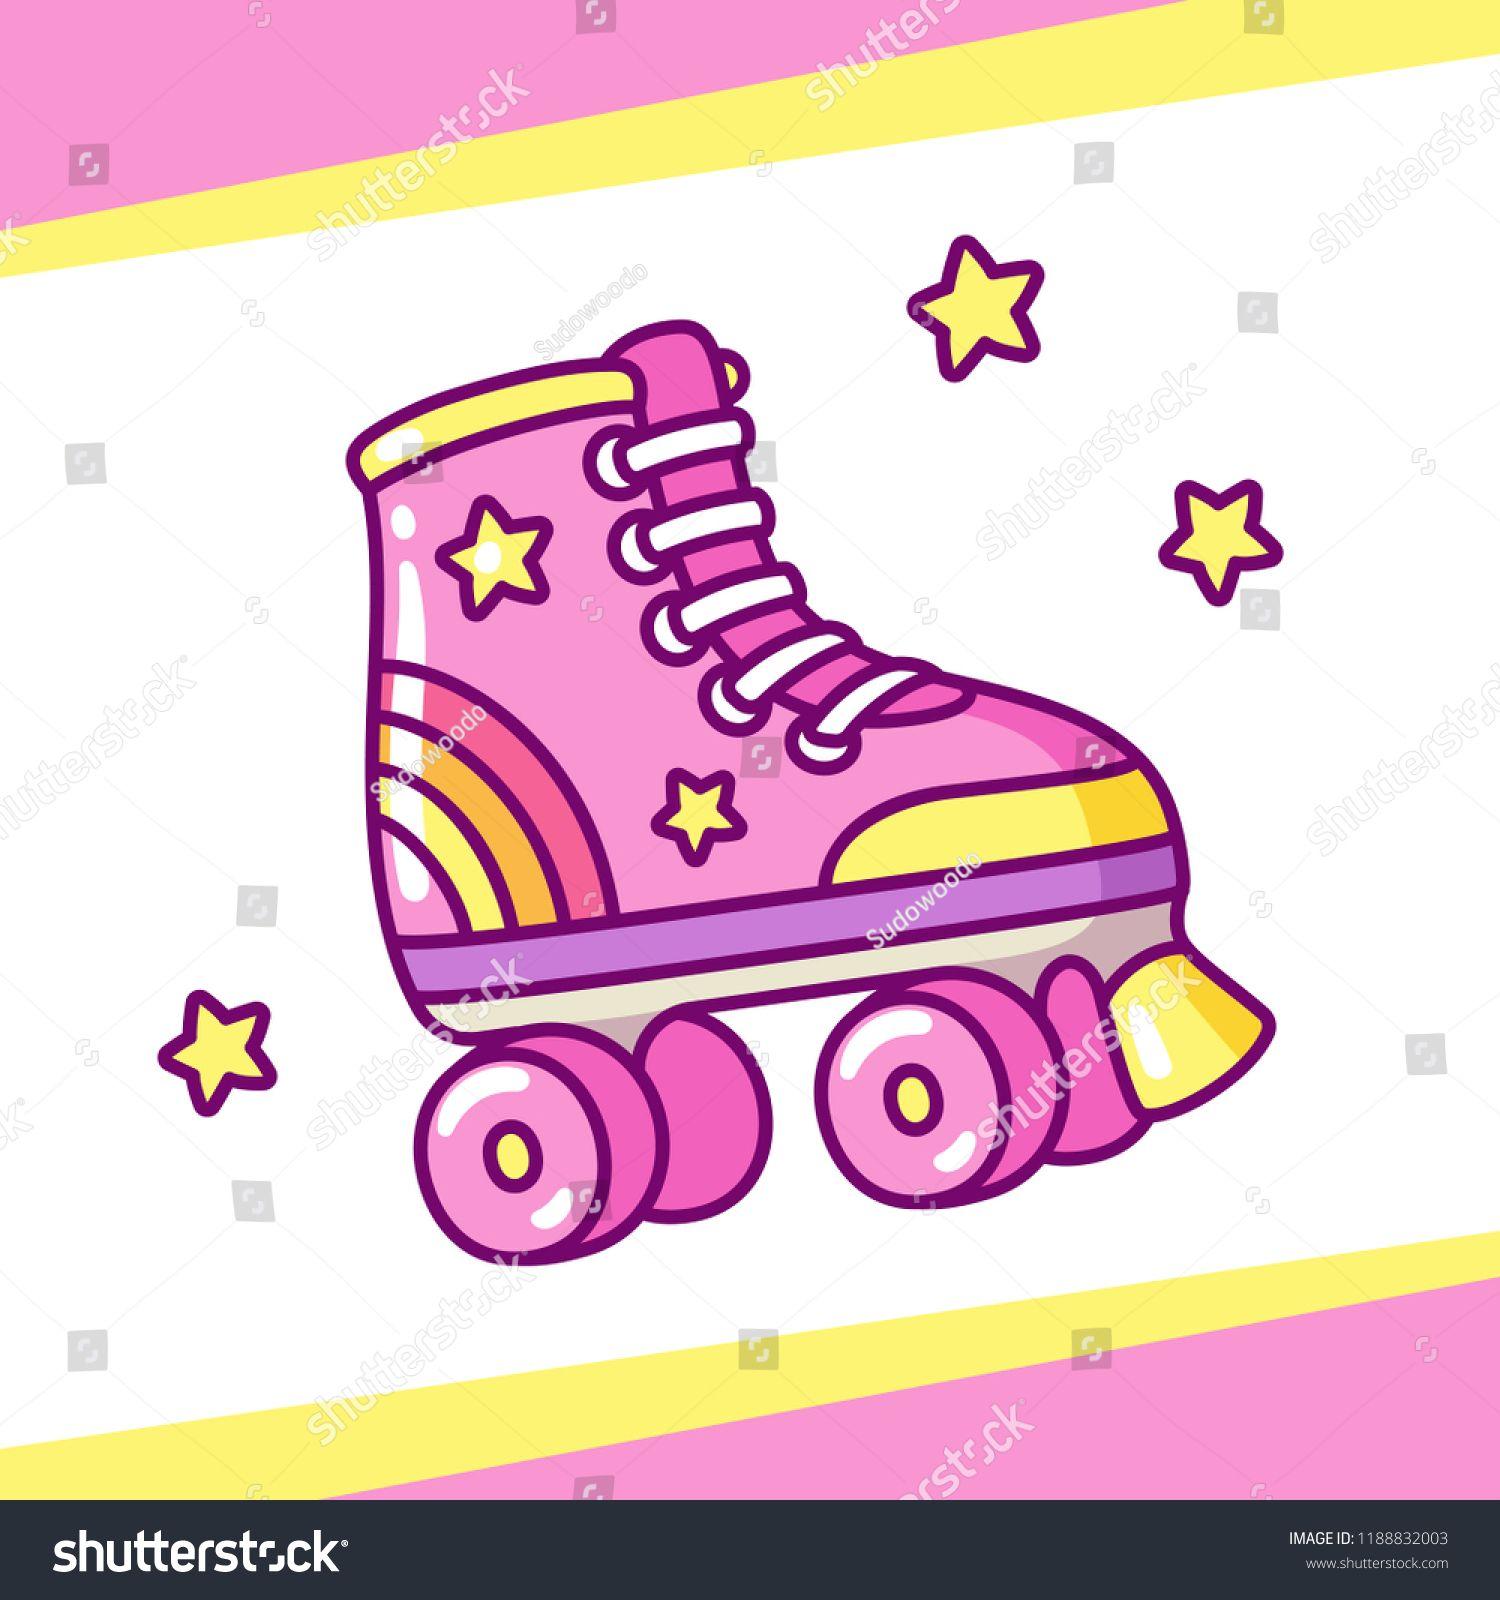 Cute Retro Style Roller Skates Drawing Hand Drawn Cartoon Vector Illustration Roller Skates Style Cute Roller Skates Pink Roller Skates Cartoons Vector